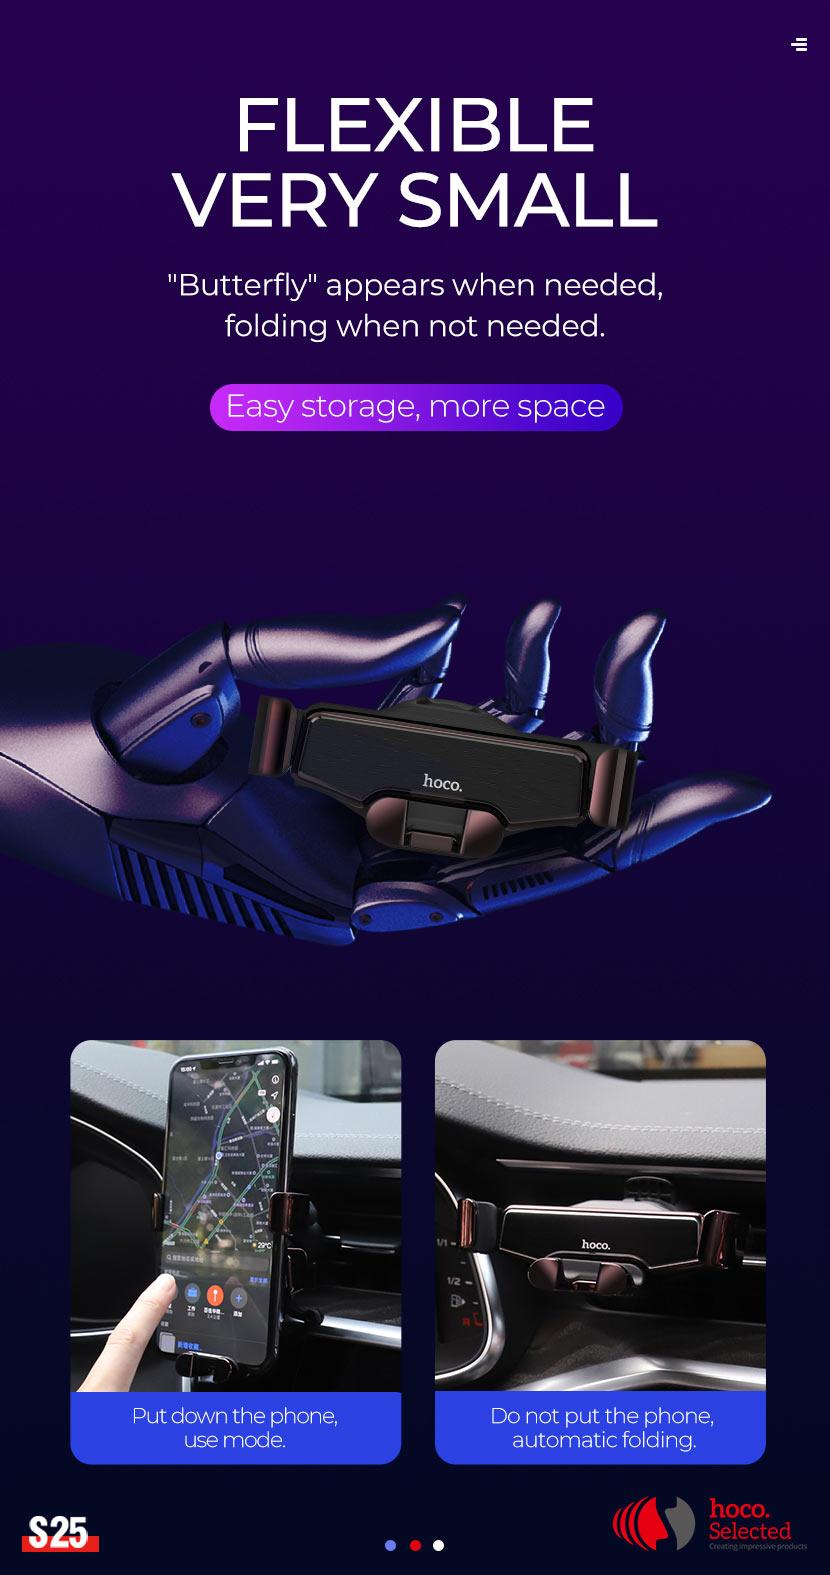 hoco selected news s25 guide gravity linkage car holder flexible en